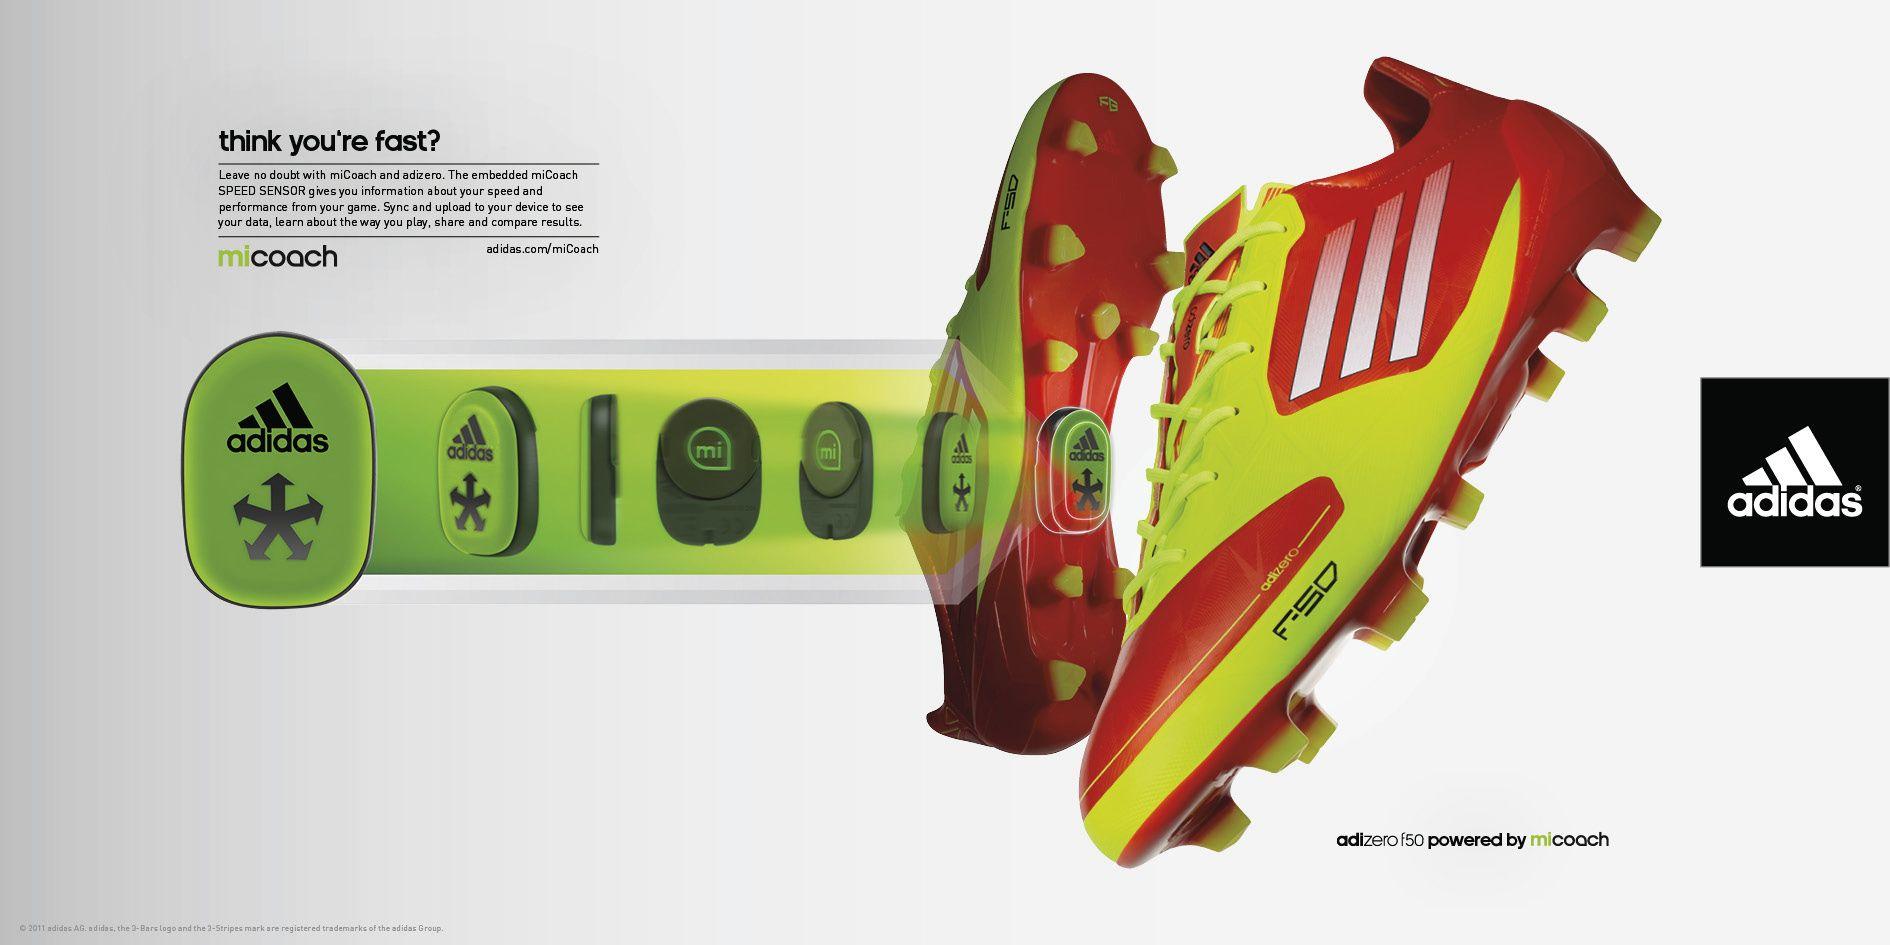 adidas-micoach.jpg (1890×945)